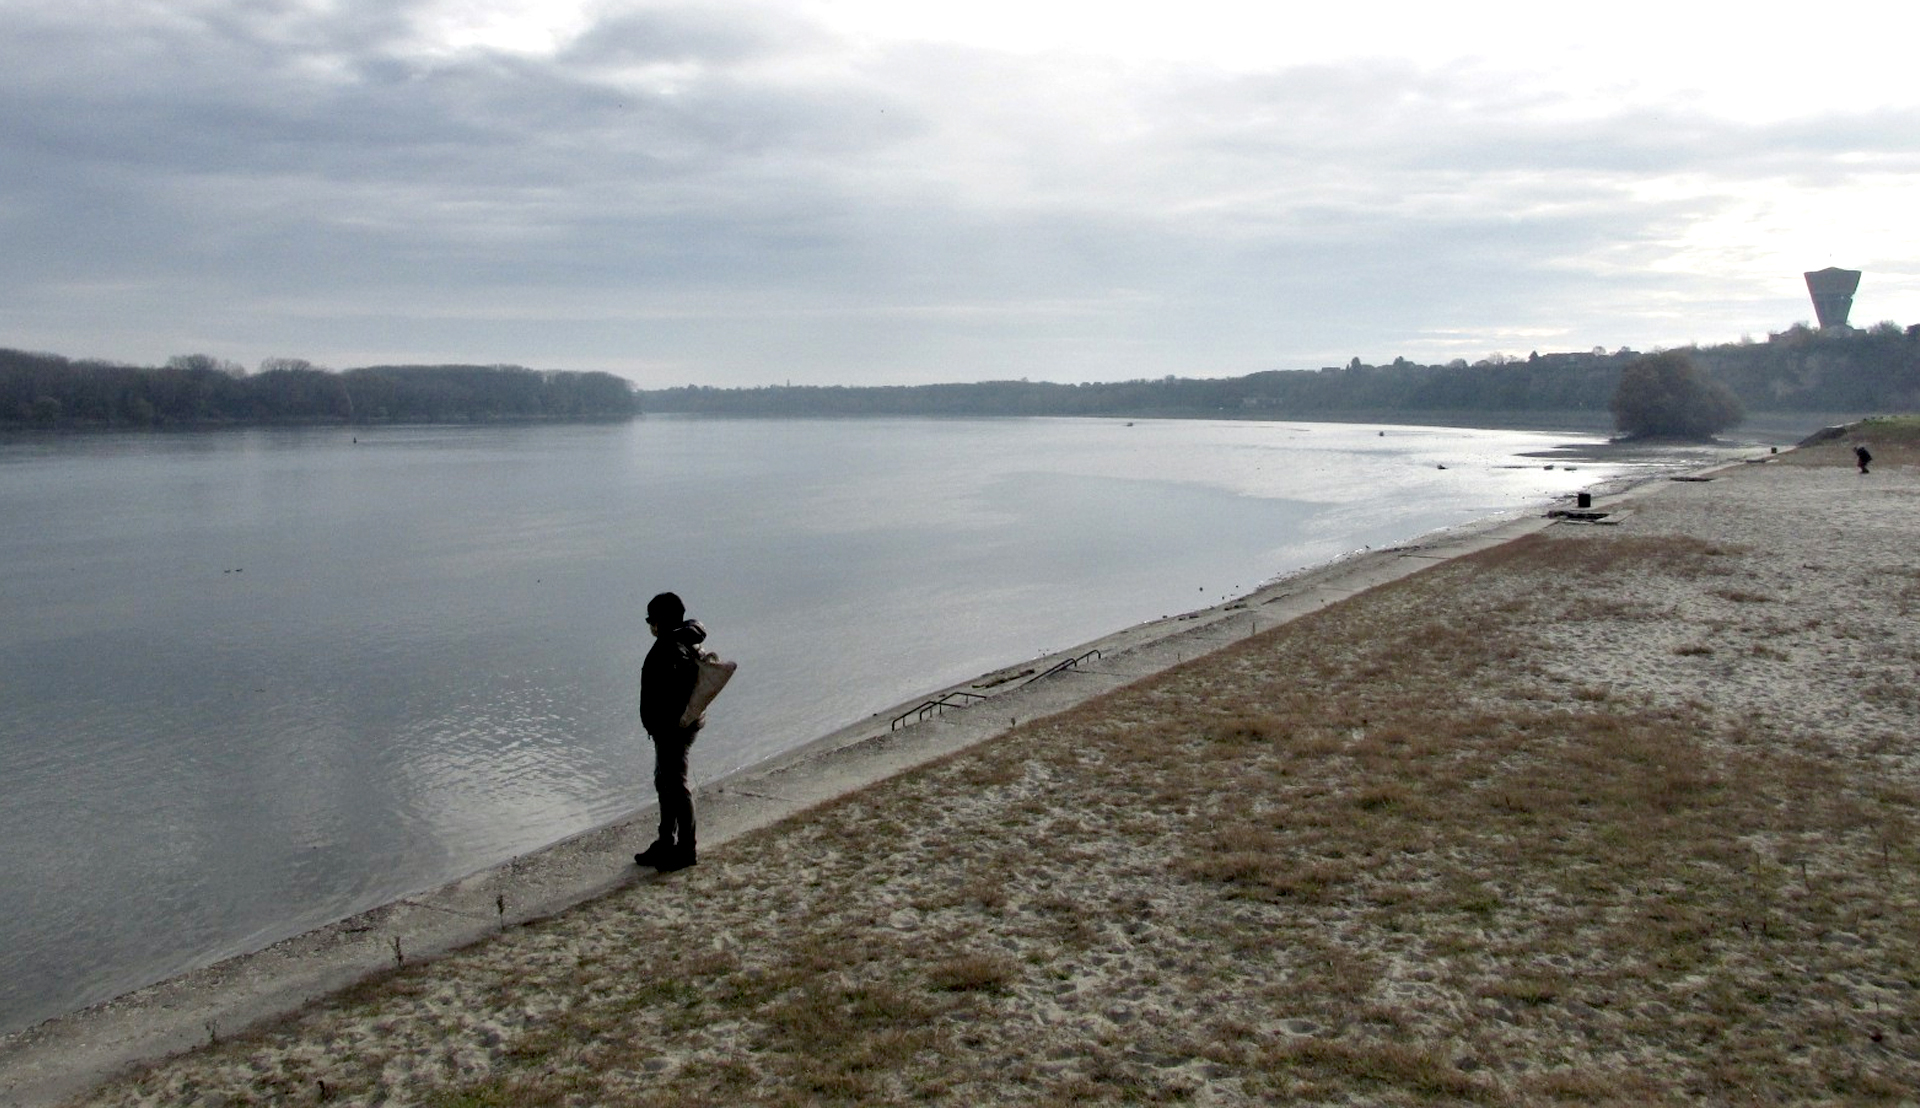 Vukovar, ll Danubio e la terra Magiara